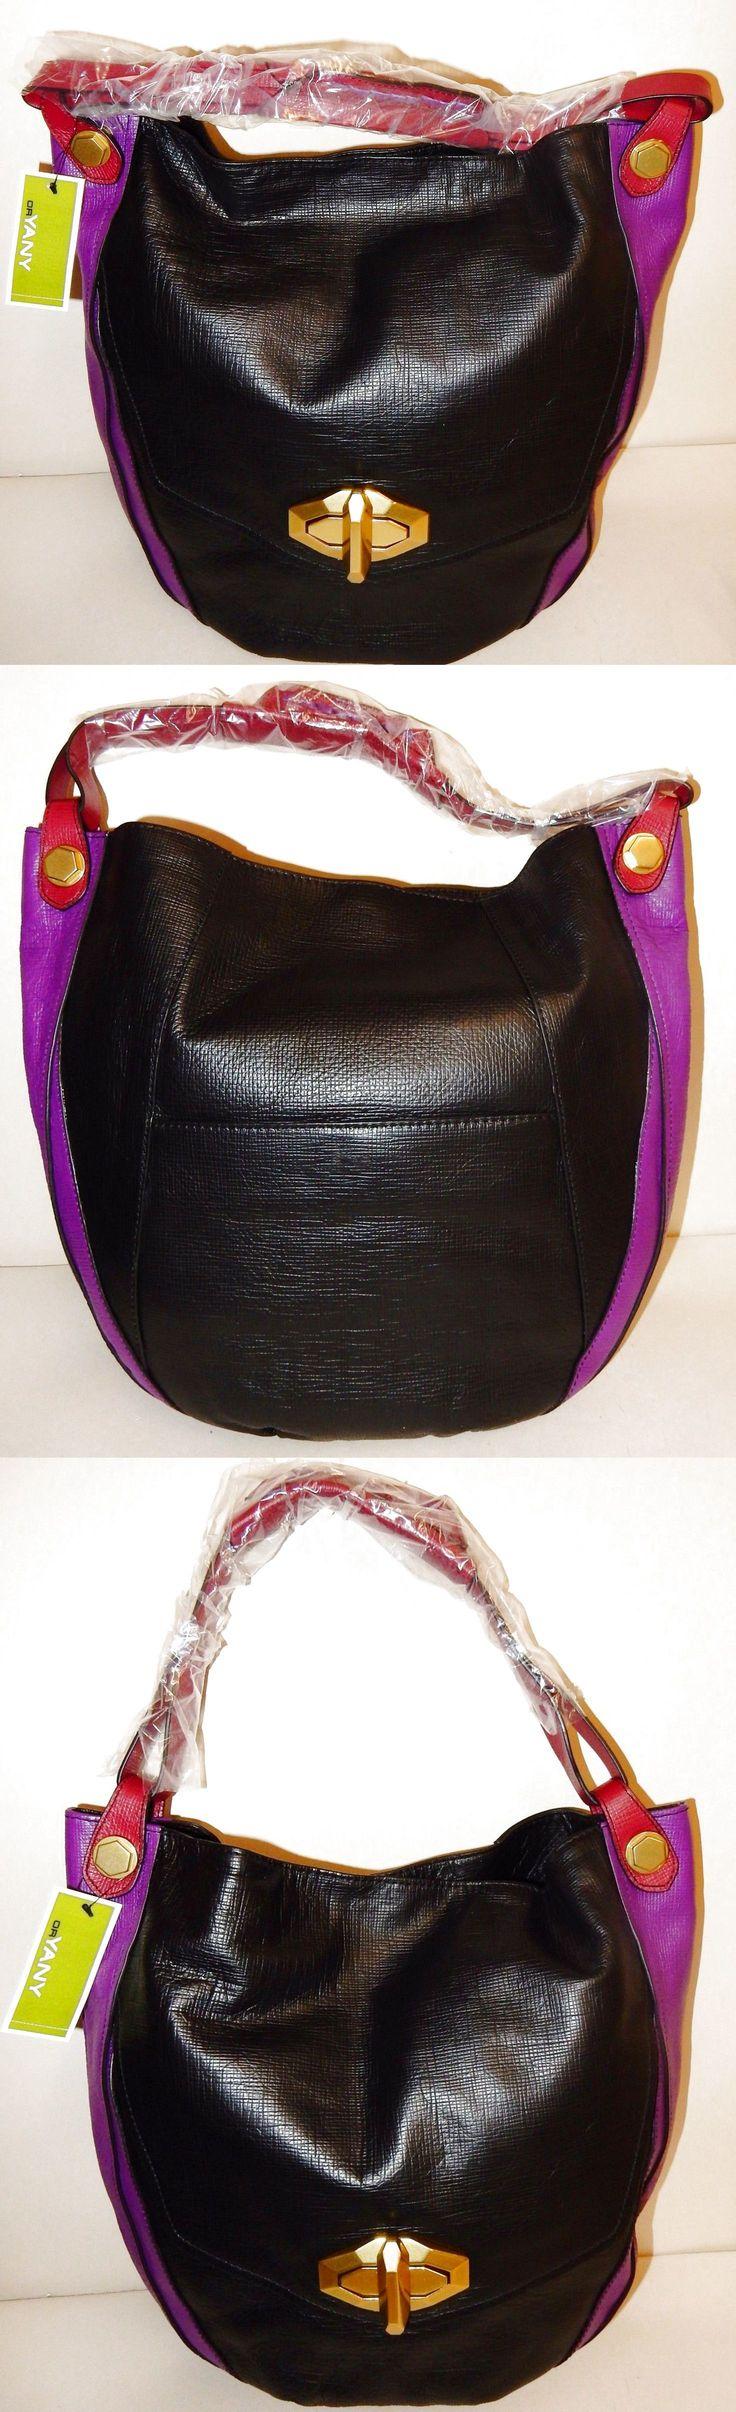 New orYANY Julia Italian Diamond Leather Hobo Bag Black Multi $159.99